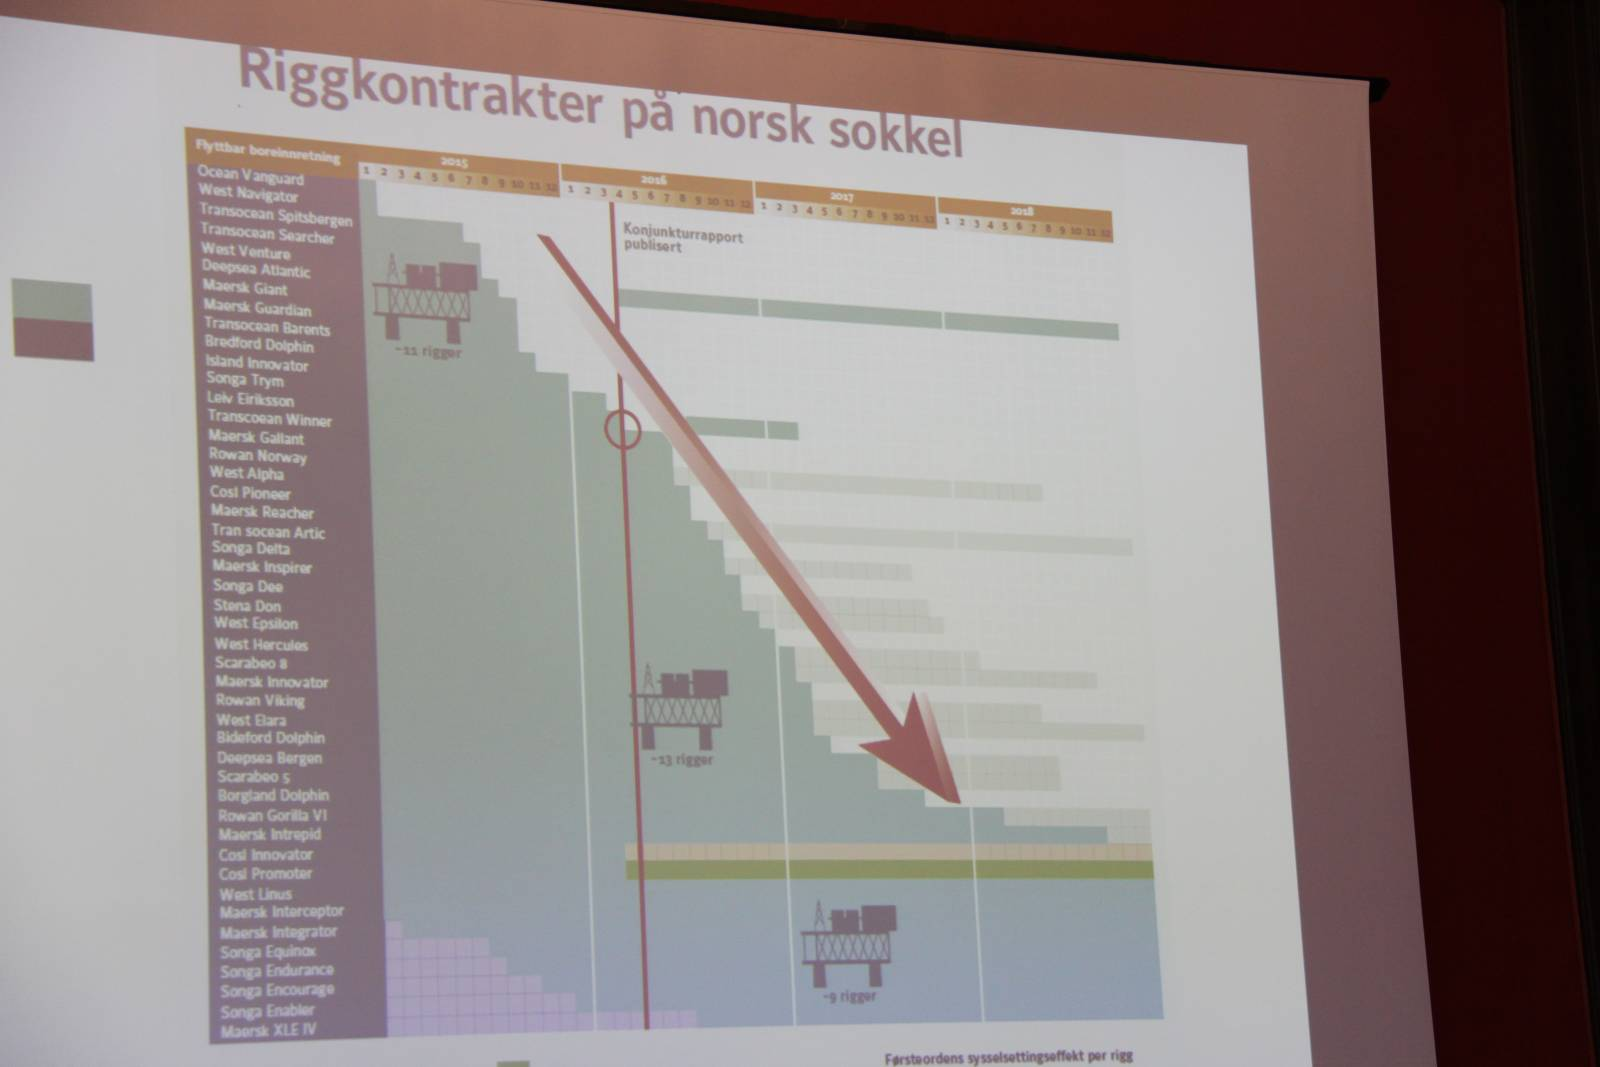 Riggkontrakter på norsk sokkel